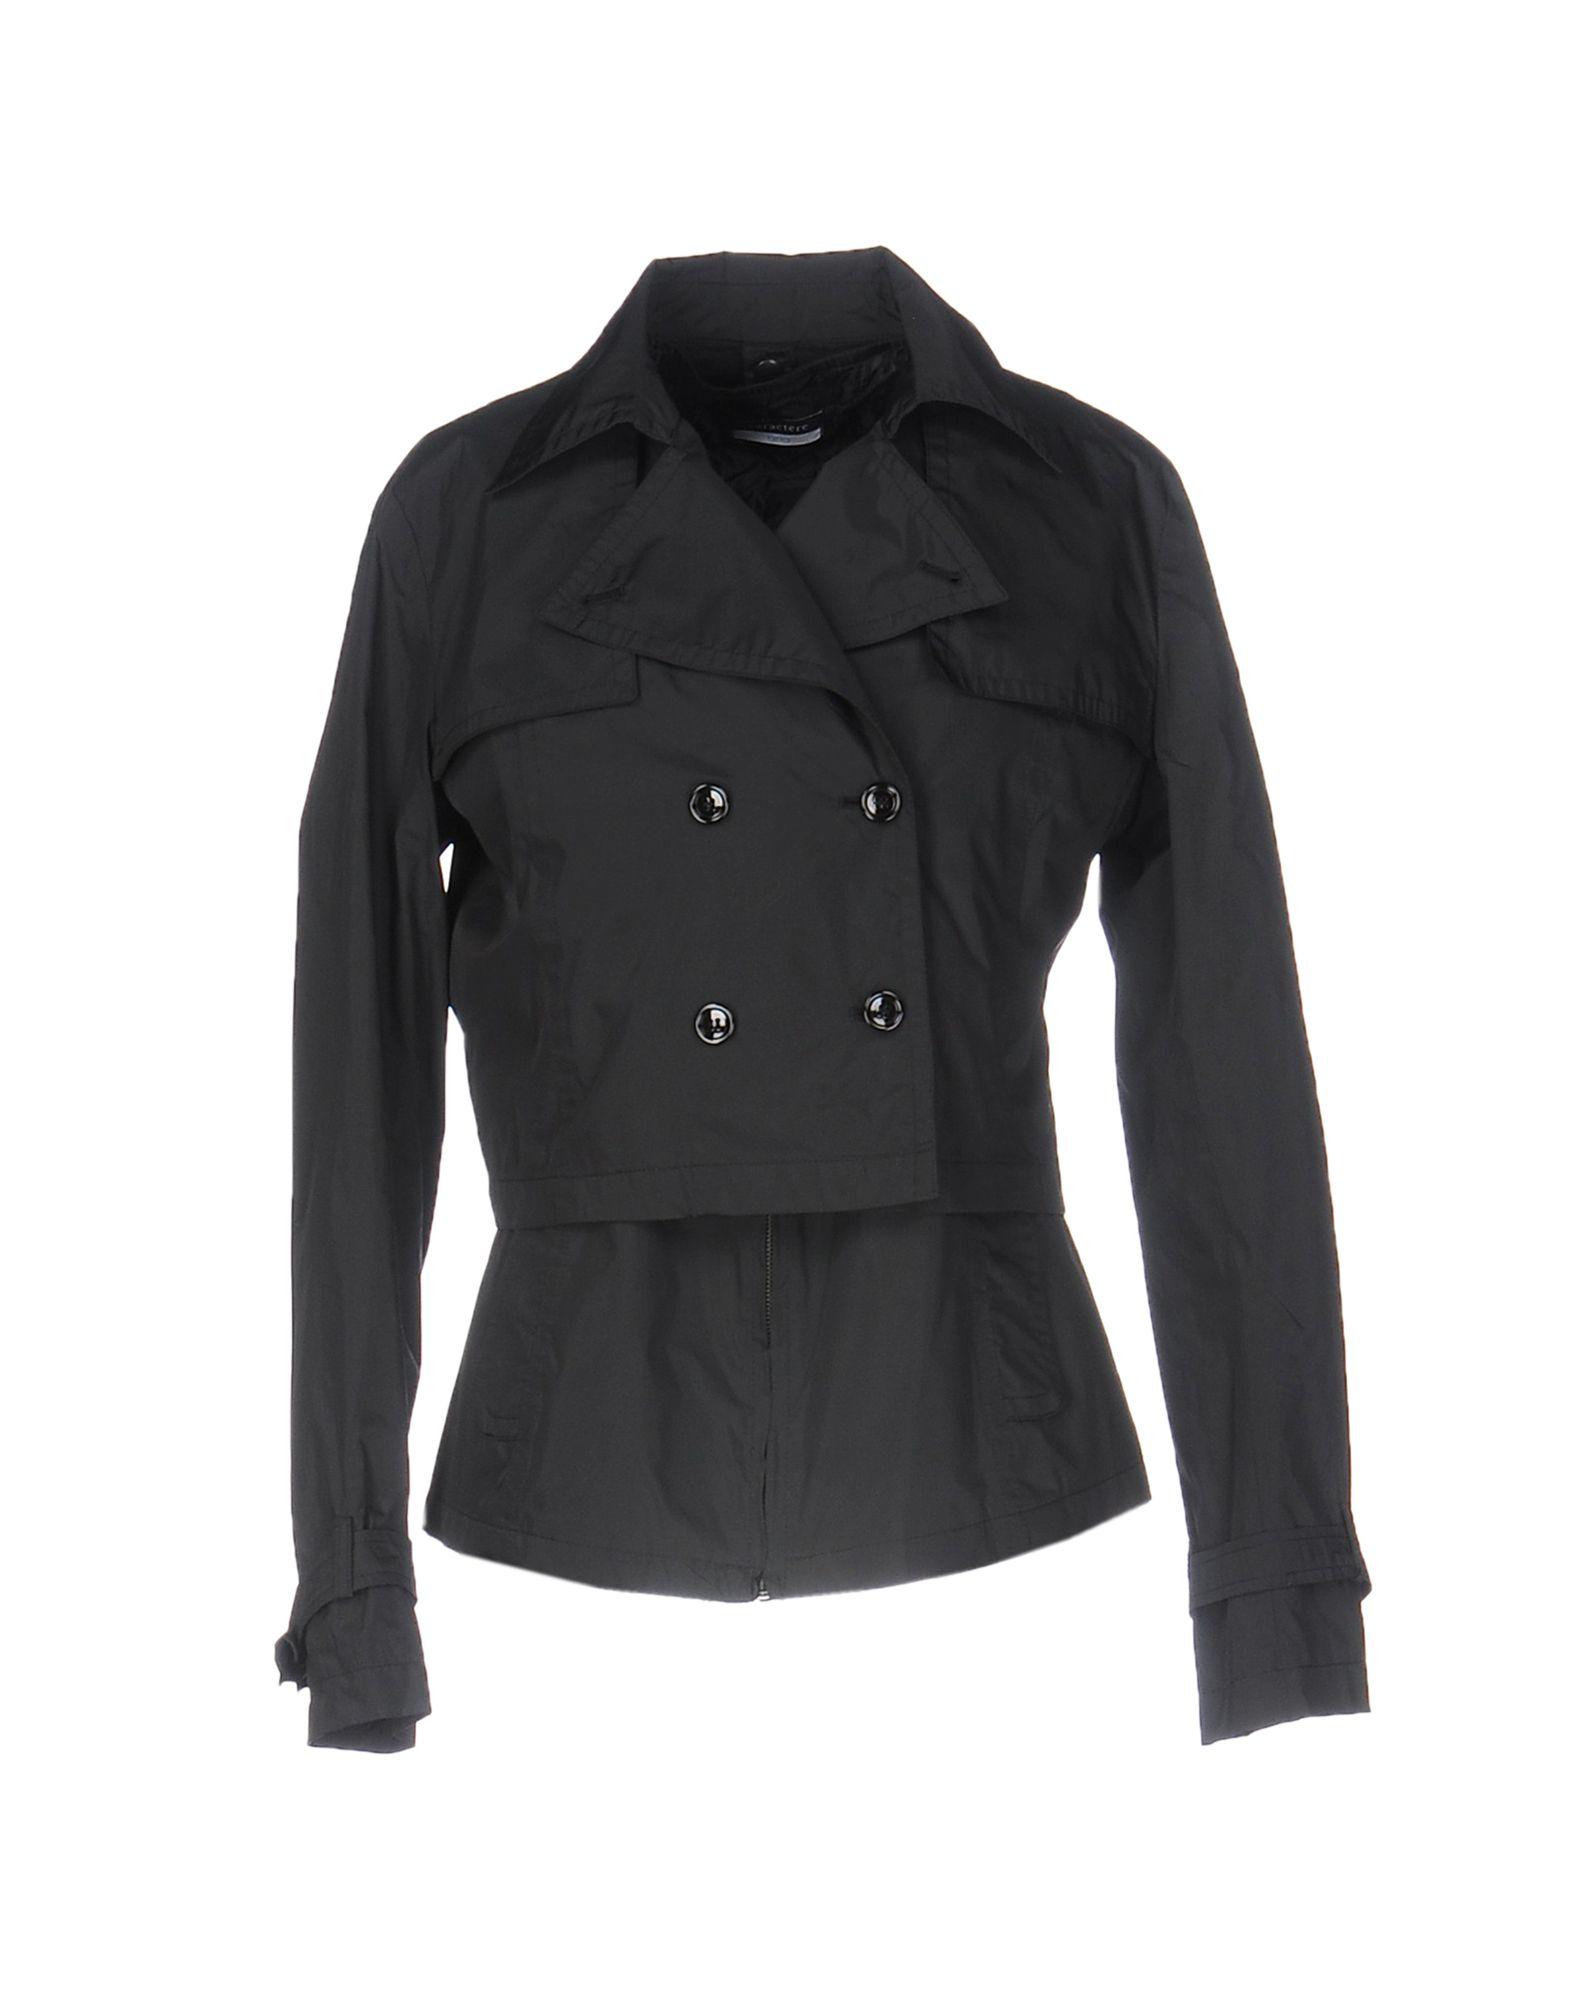 caractère aria куртка CARACTÈRE ARIA Куртка